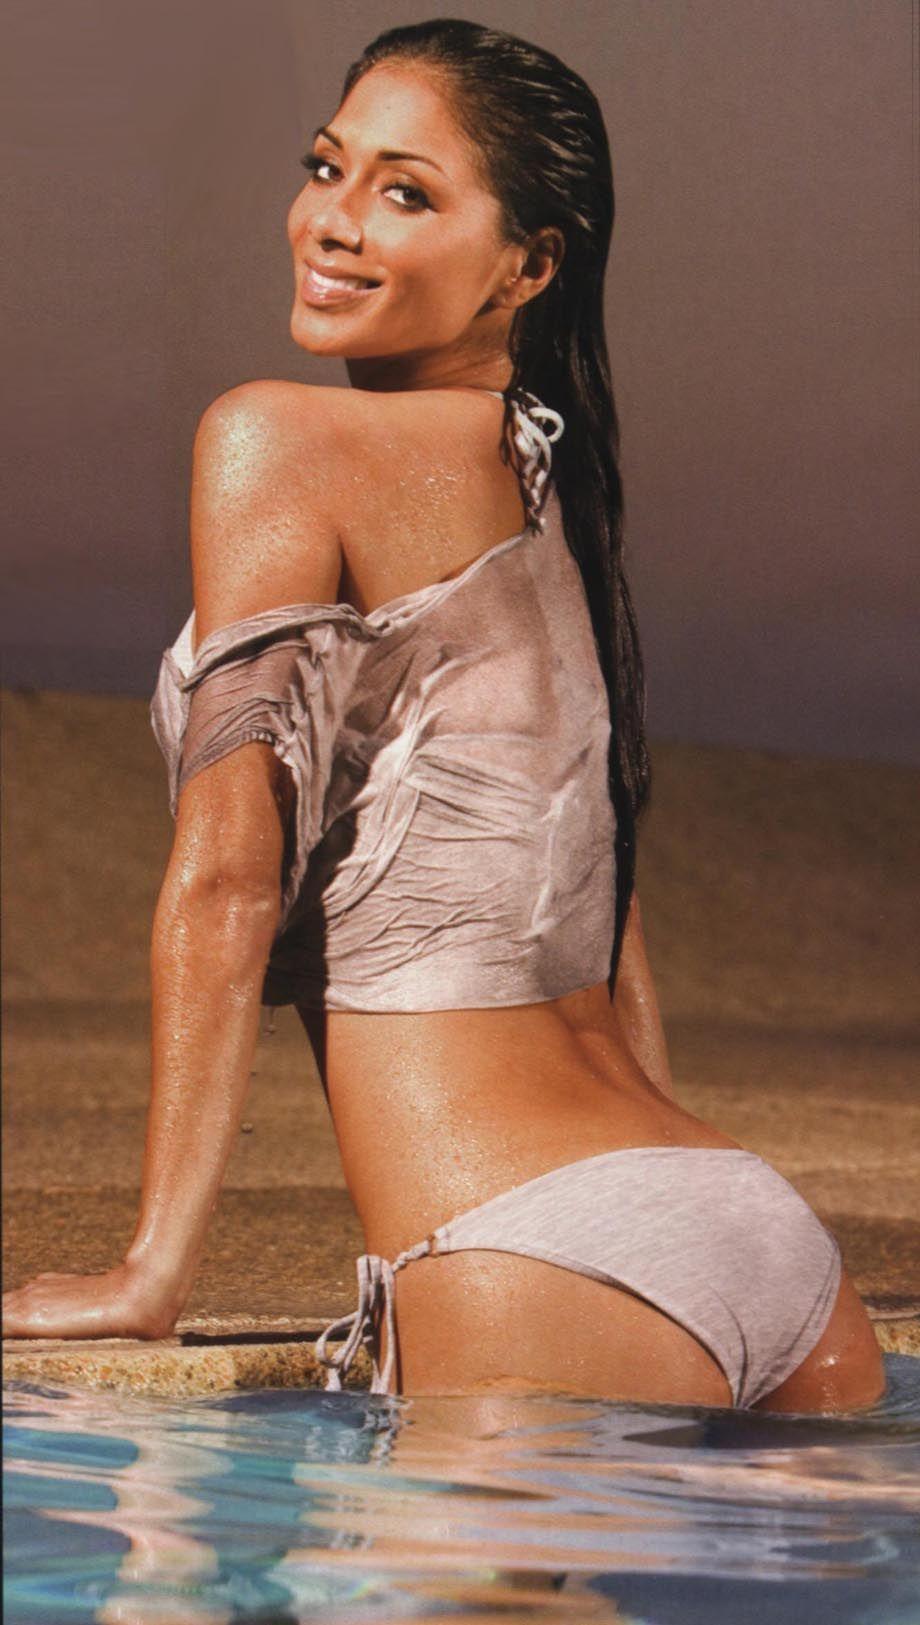 Nicole scherzinger hottest pics